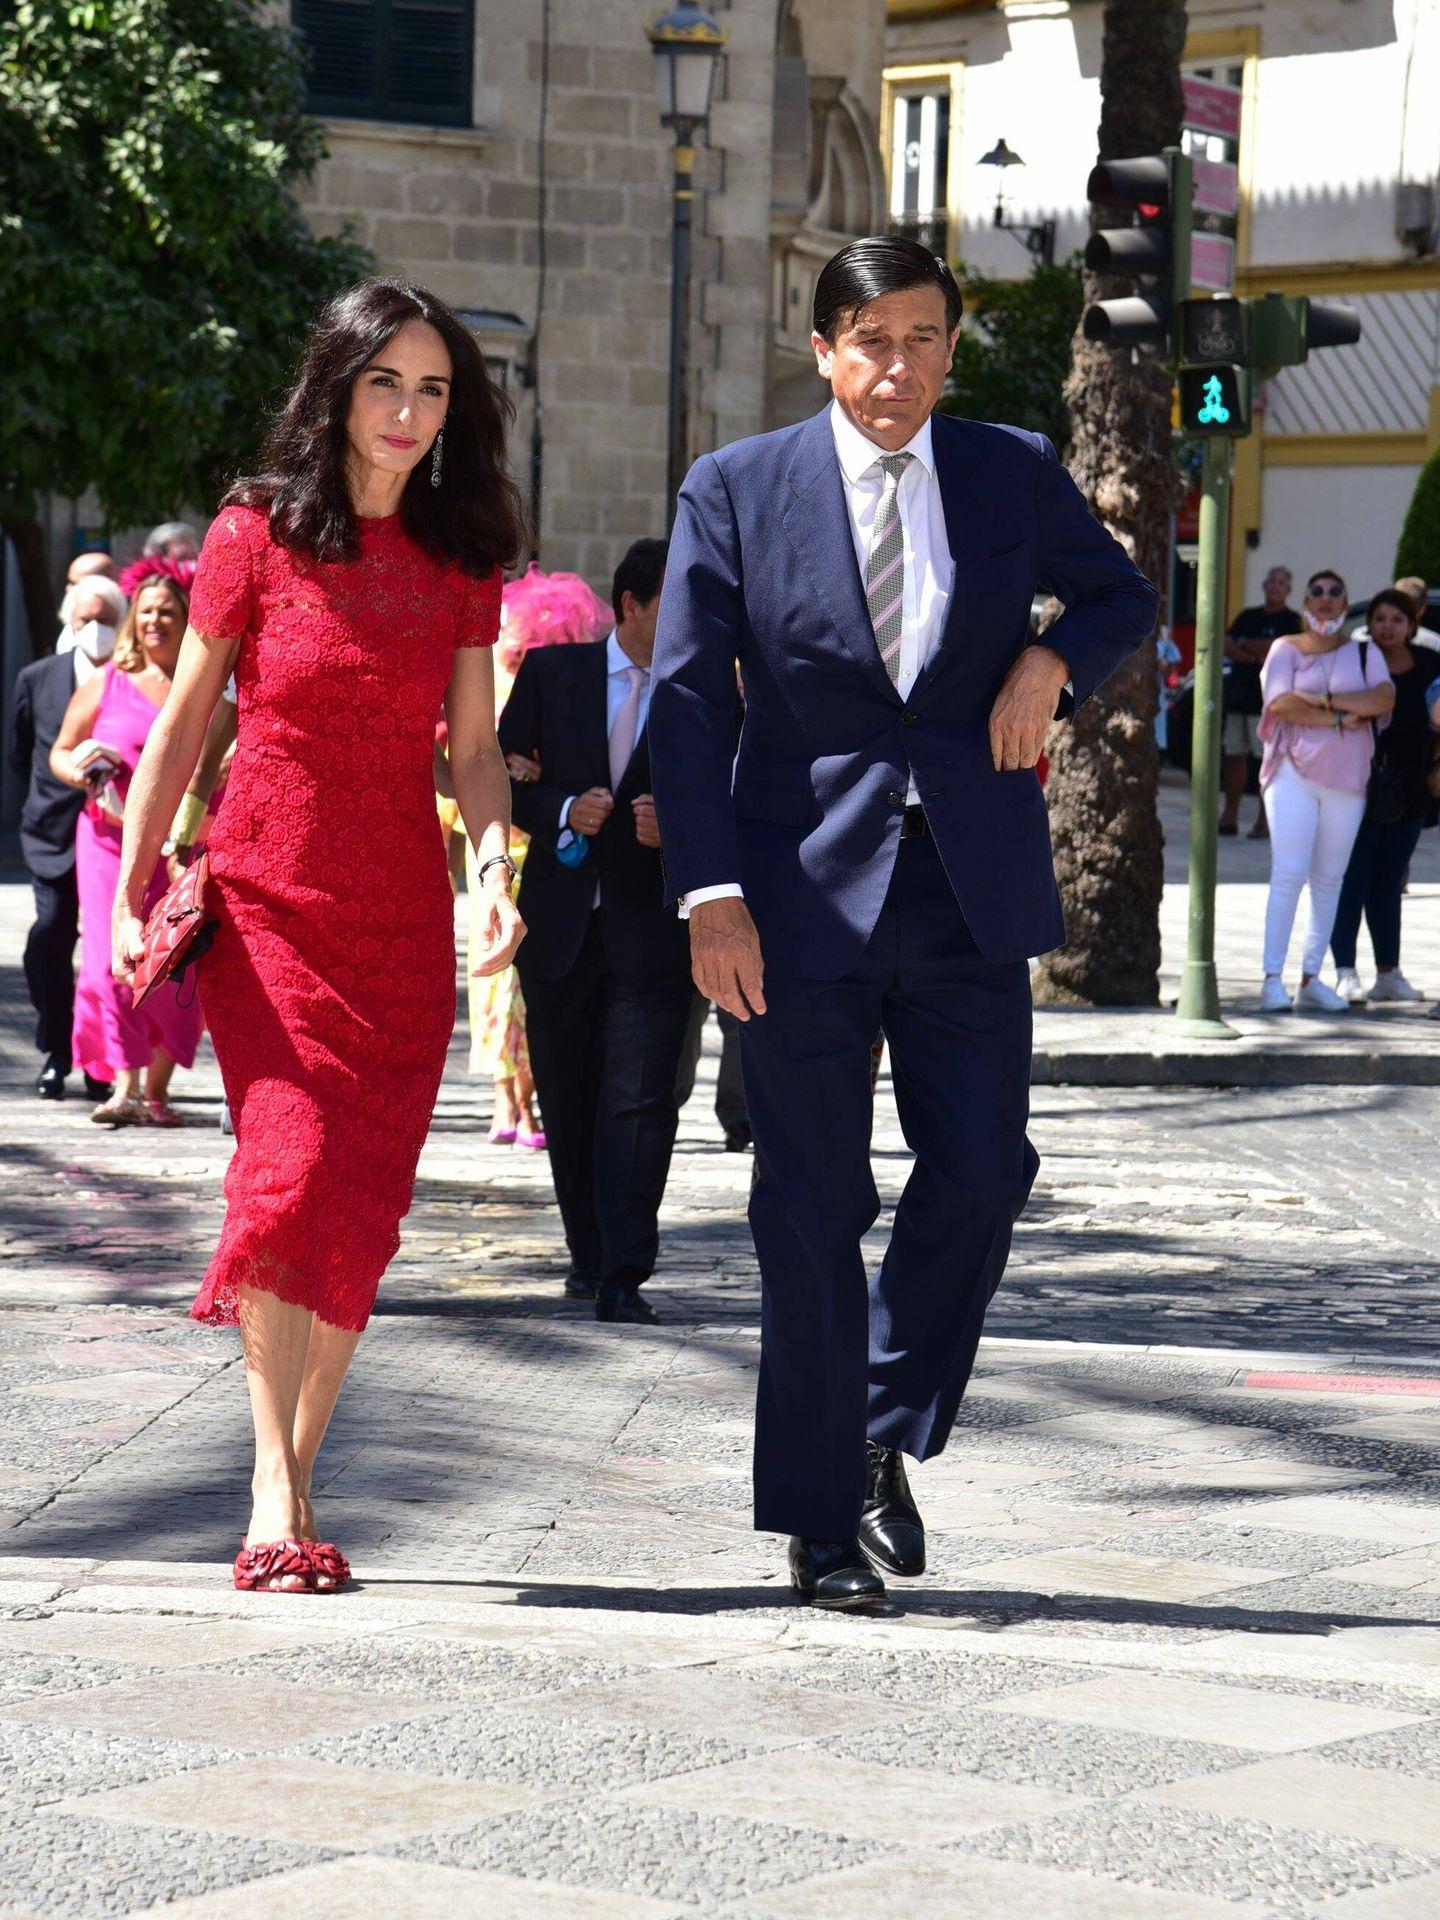 Amparo Corsini y Manuel Falcó, marqueses de Castel-Moncayo. (CP)